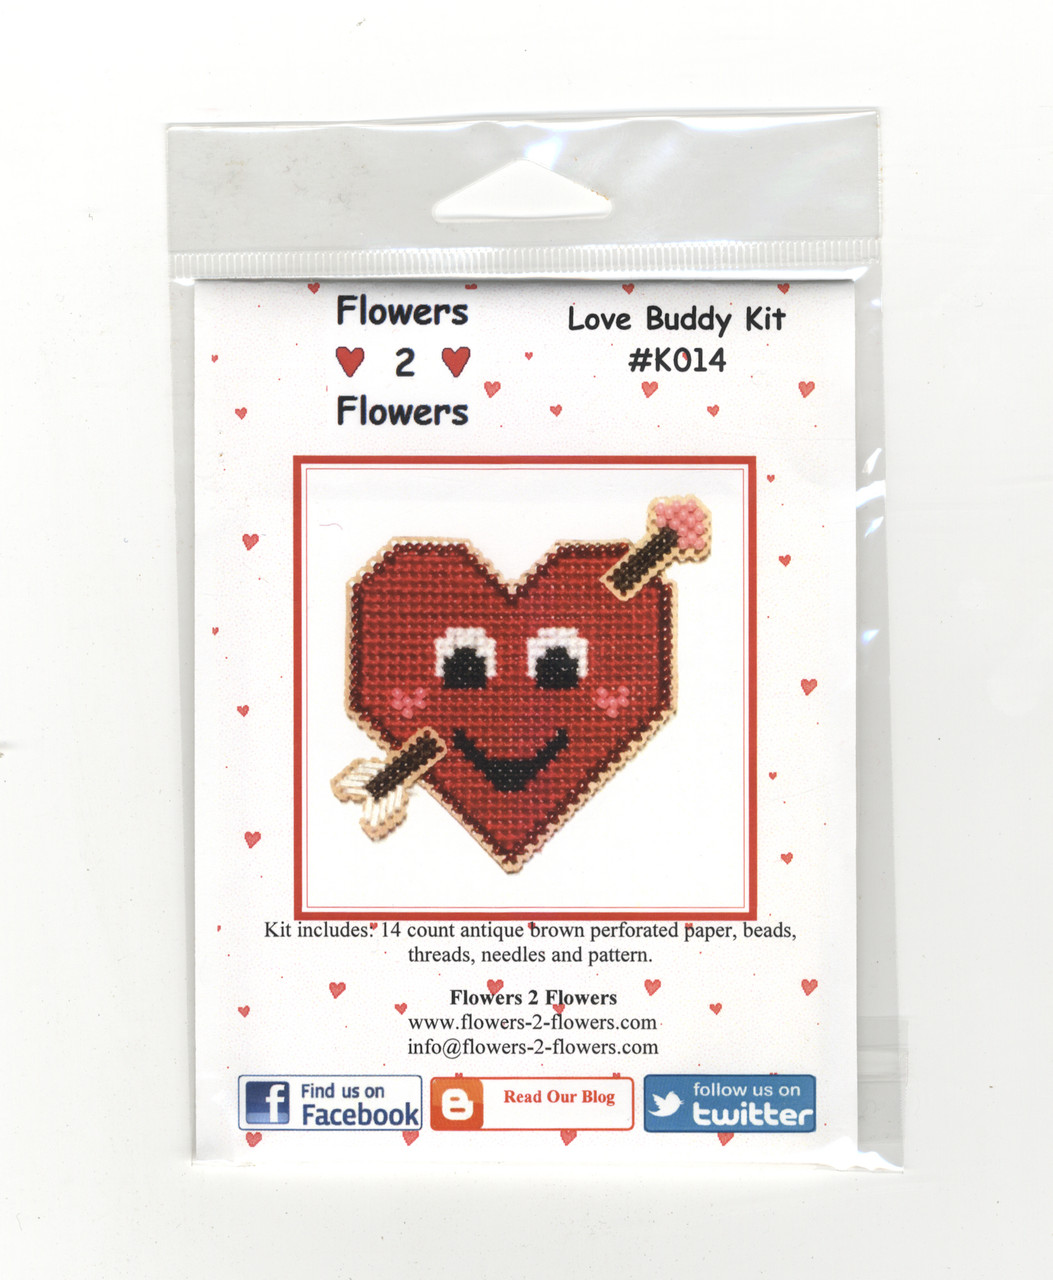 Flowers 2 Flowers - Love Buddy